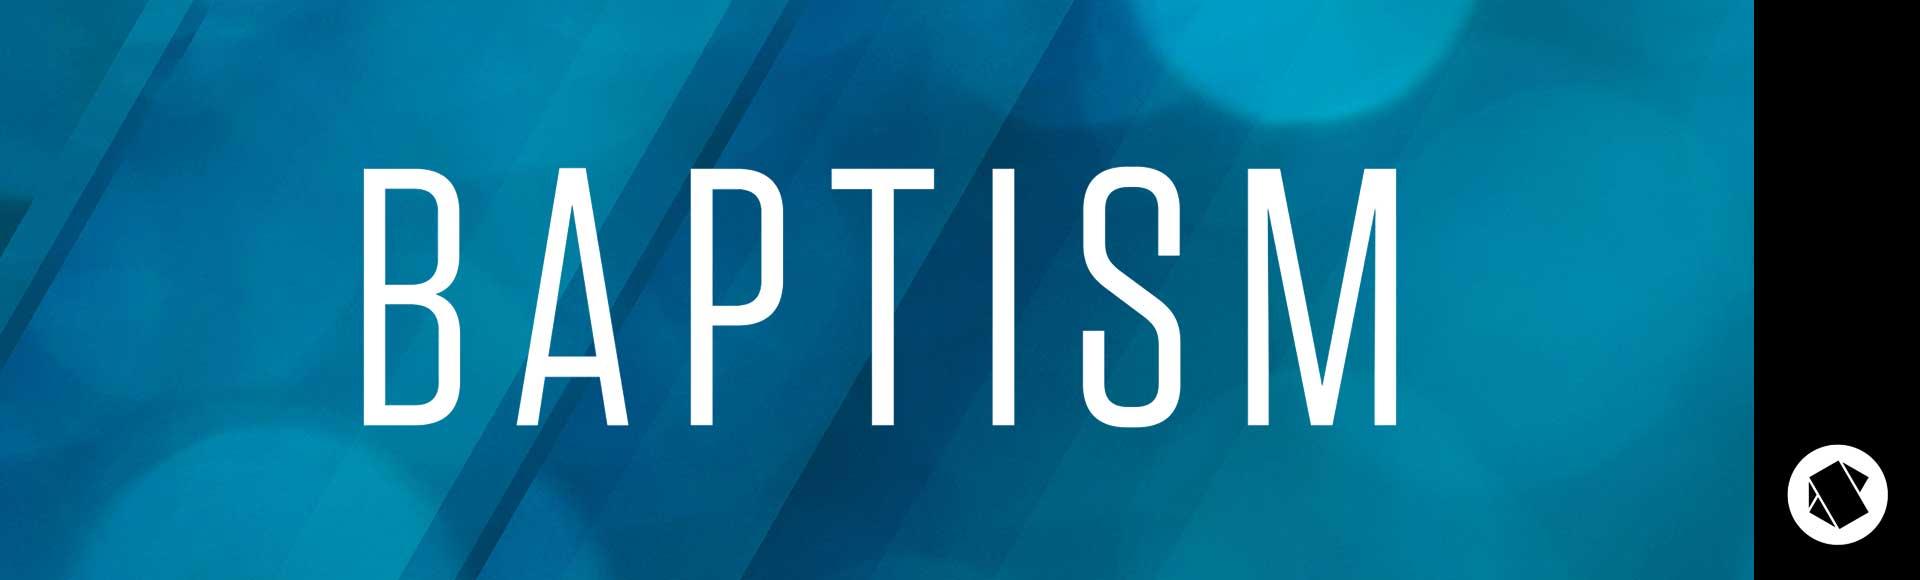 Baptism-Web-R4